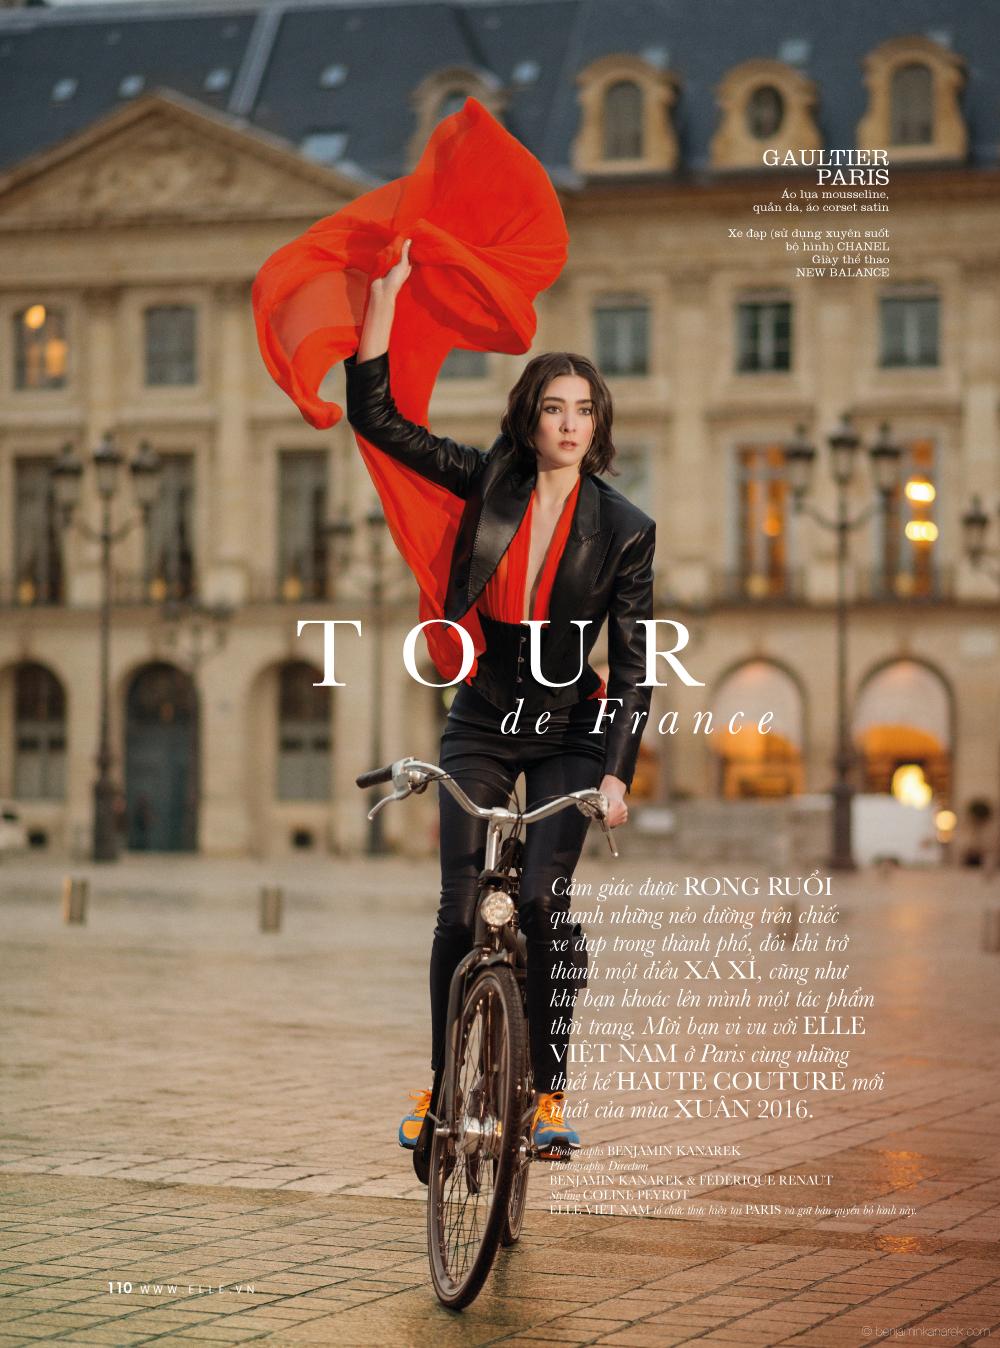 https://1.bp.blogspot.com/-zFGKkyoytpo/VvmiAmQvbdI/AAAAAAABvX0/d4h5k2J-cIAV24o8s02gzEu98Nydd3CeQ/s1600/Mar-Gonzalez-in-Tour-de-France-by-Benjamin-Kanarek-for-ELLE-02.jpg